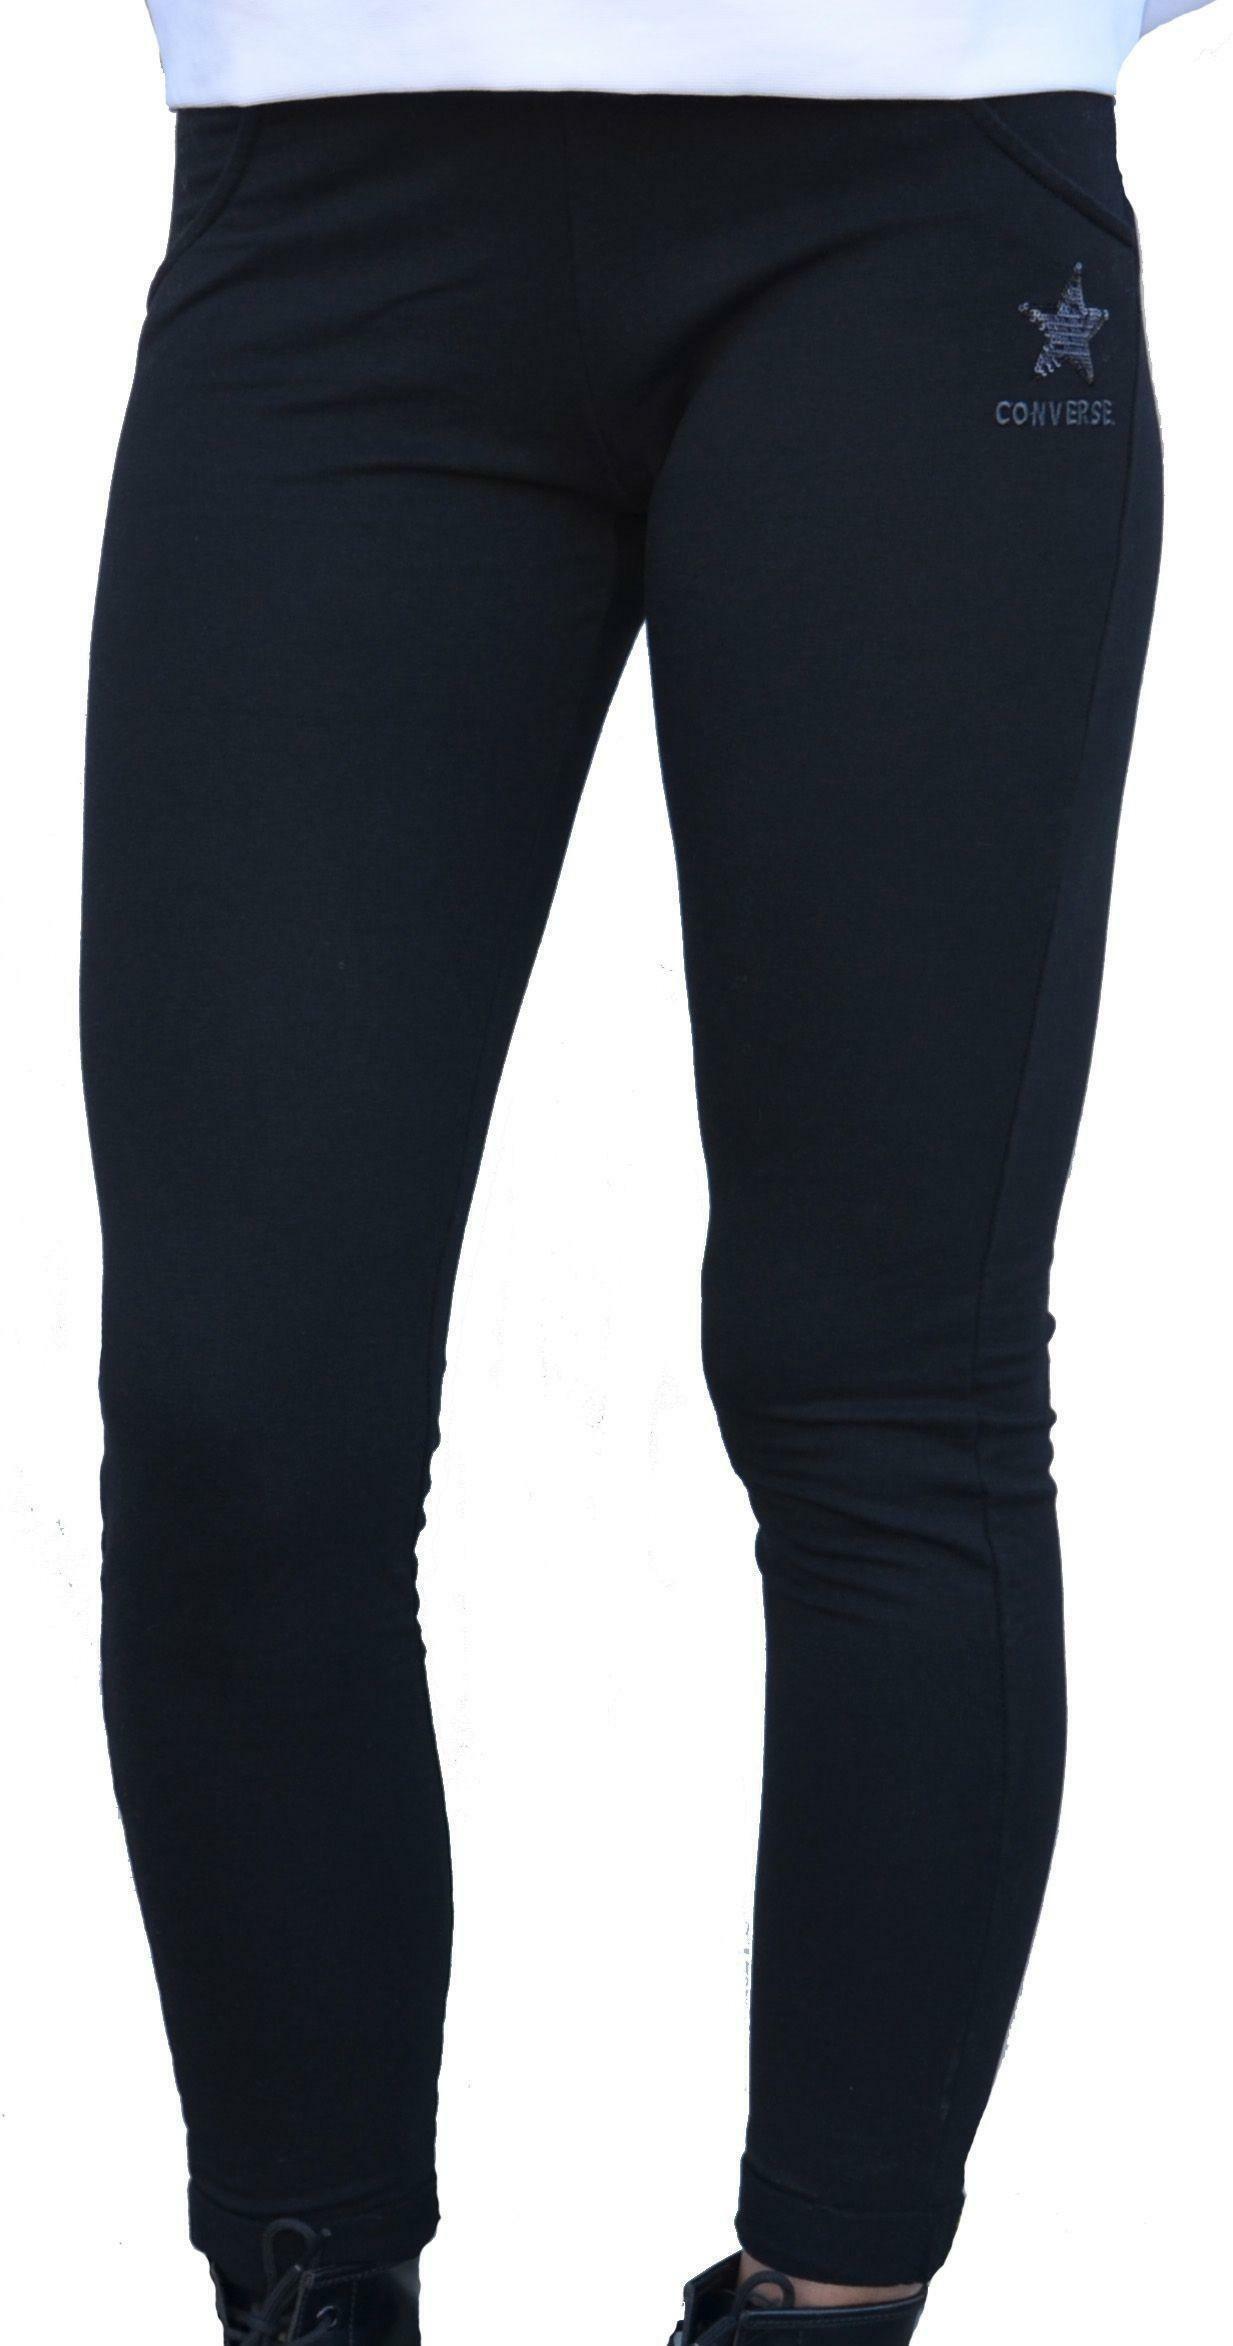 converse converse fleece hoodie pantalone tuta donna nero 10006160a01